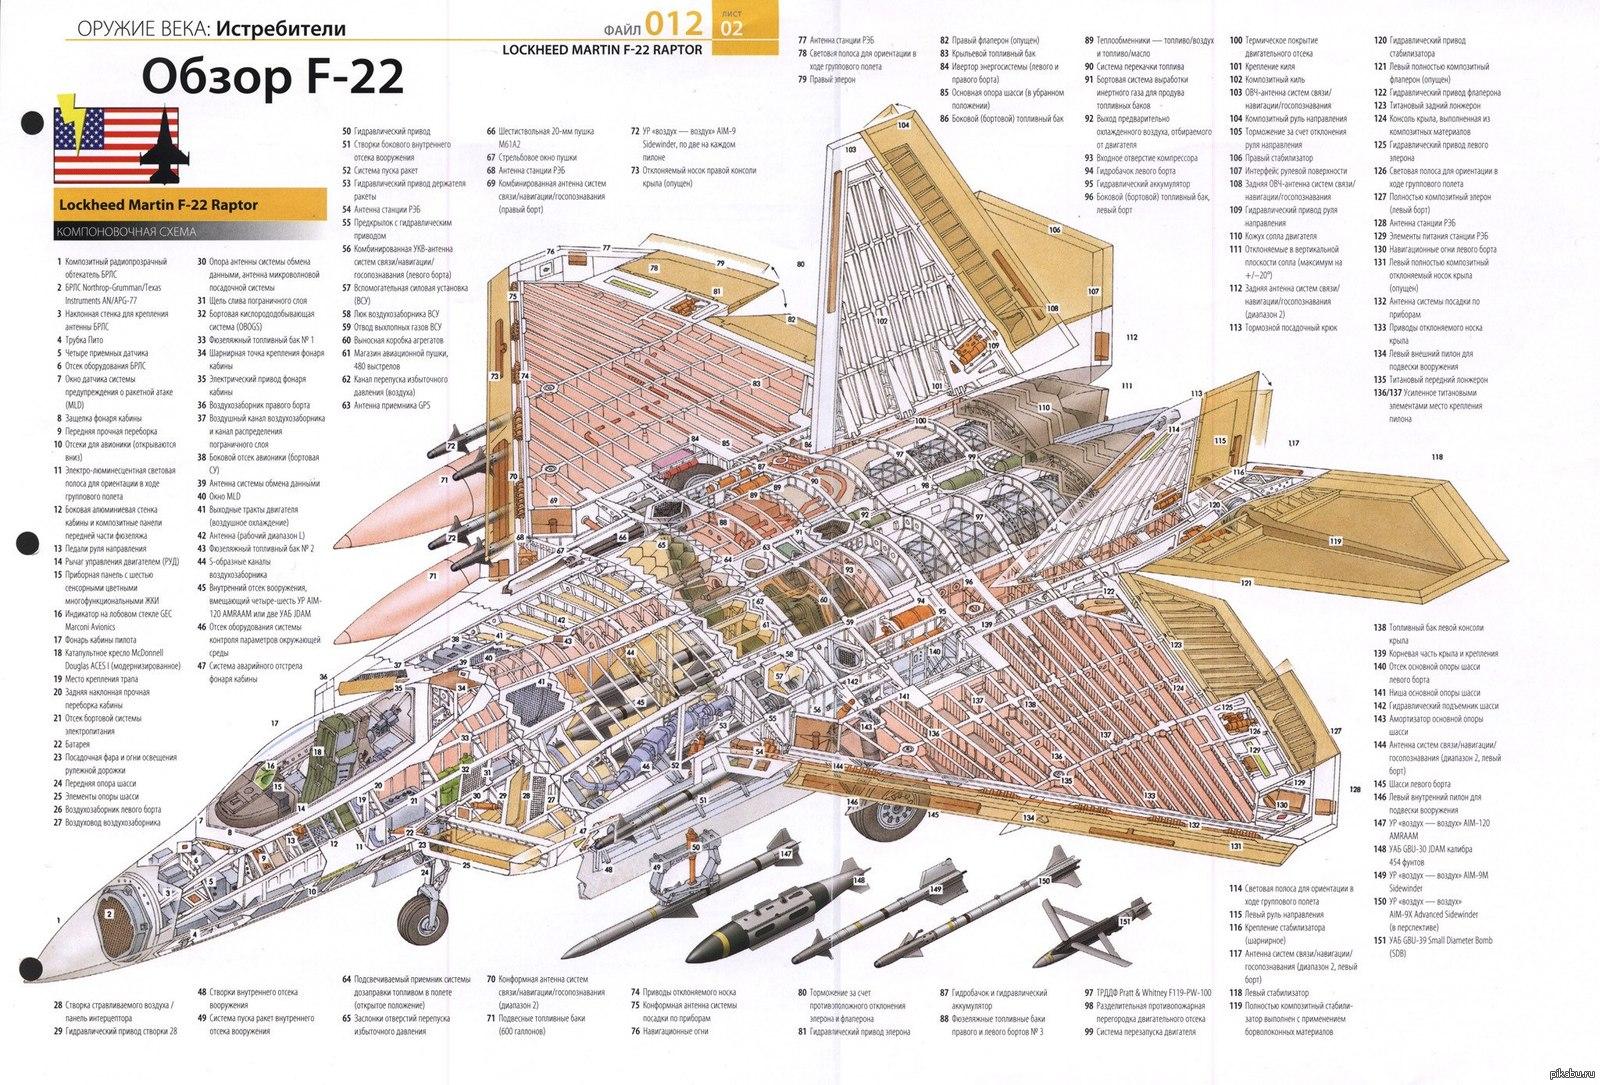 Компоновочная схема самолёта F22